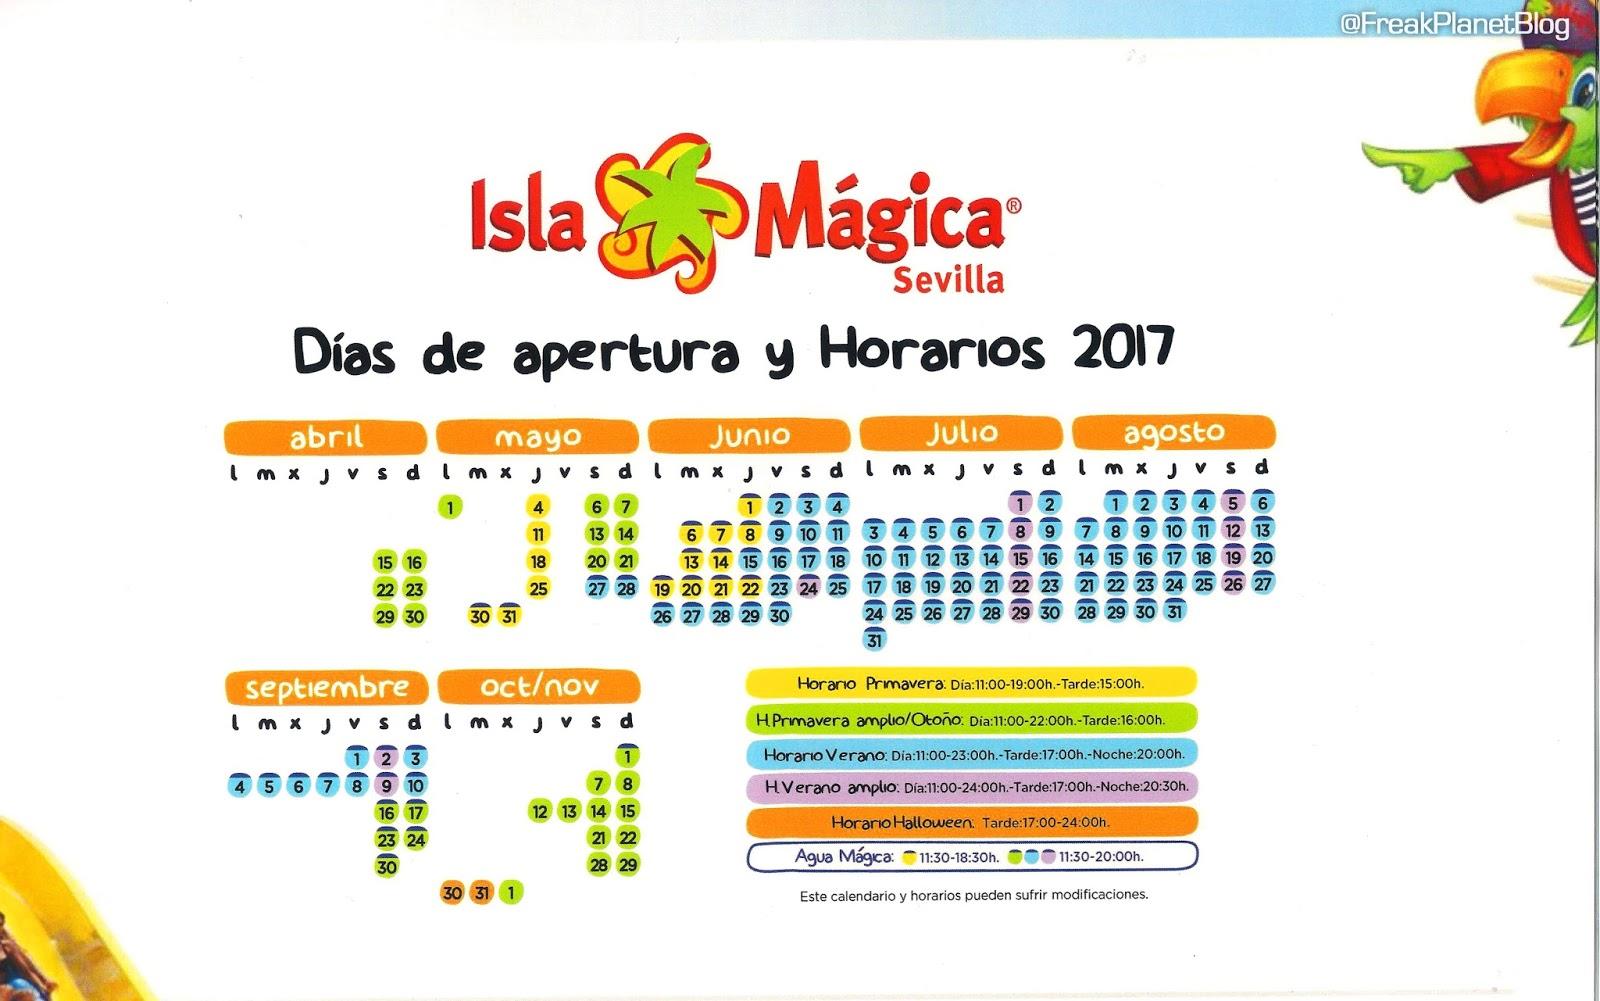 Noticias breves de parques espa oles - Isla magica ofertas 2017 ...